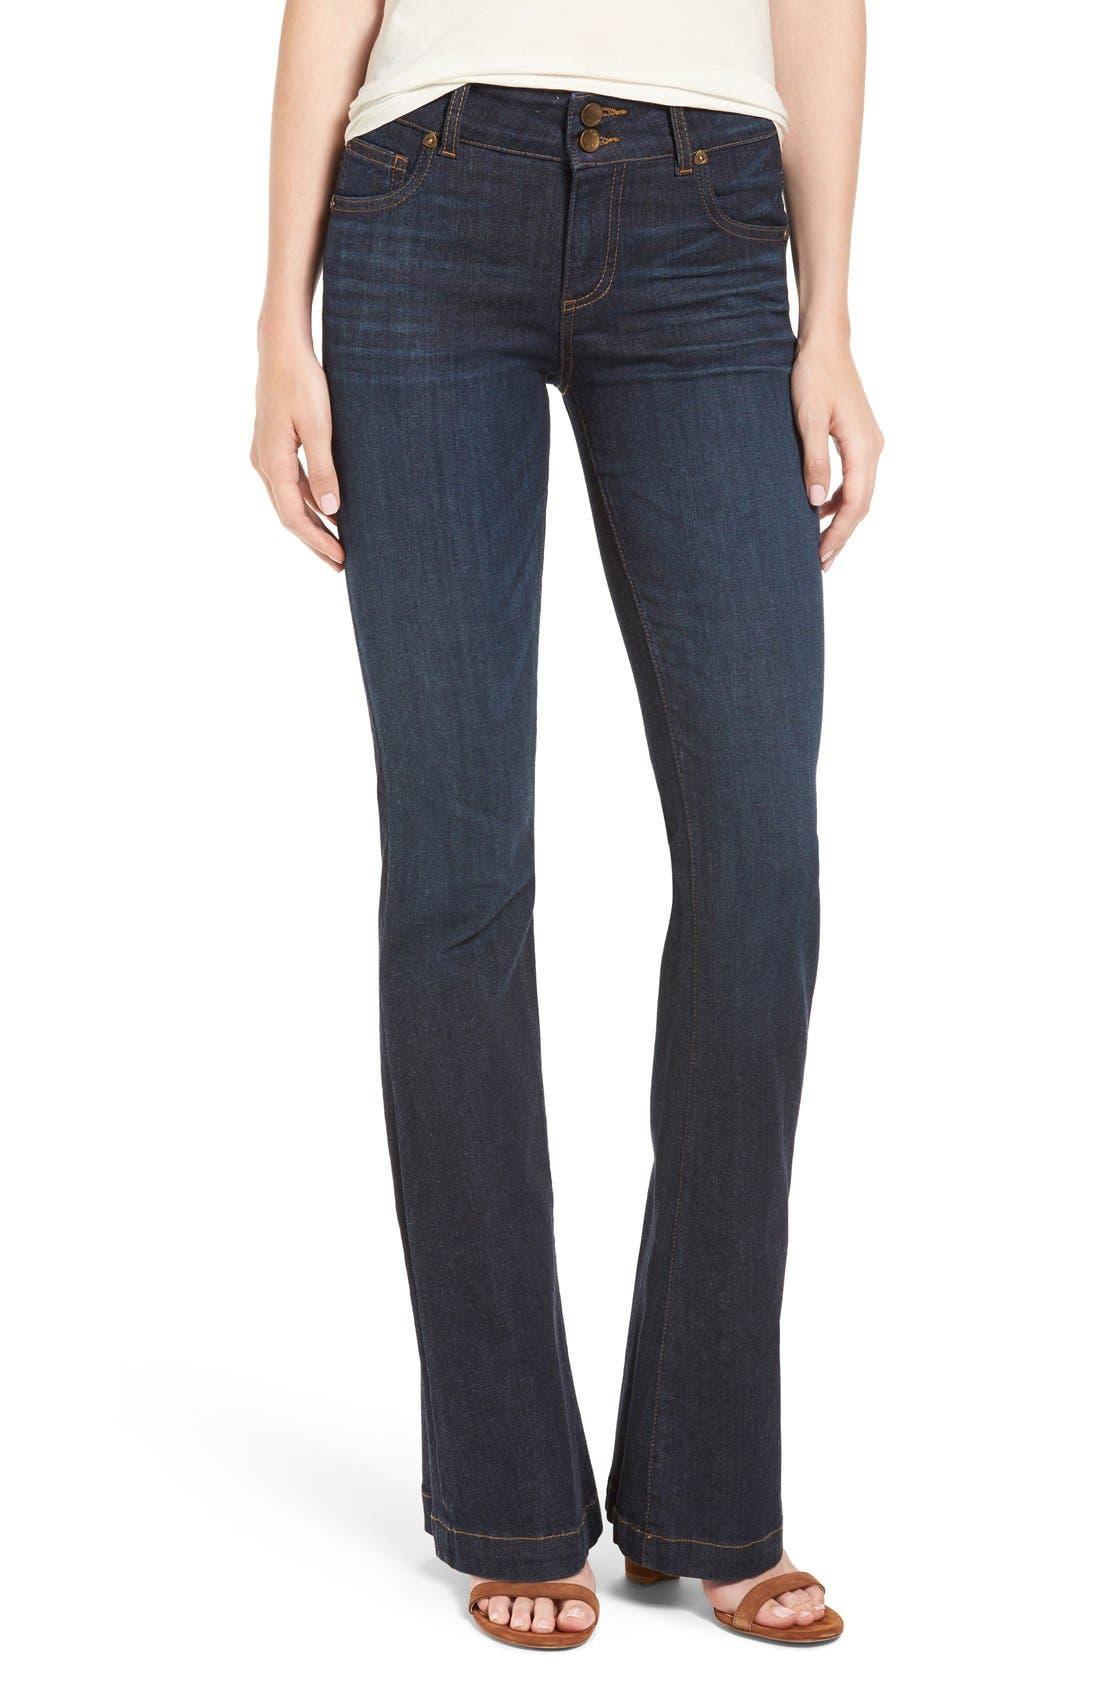 Main Image - KUT from the Kloth 'Chrissy' Flare Leg Jeans (Brightness)